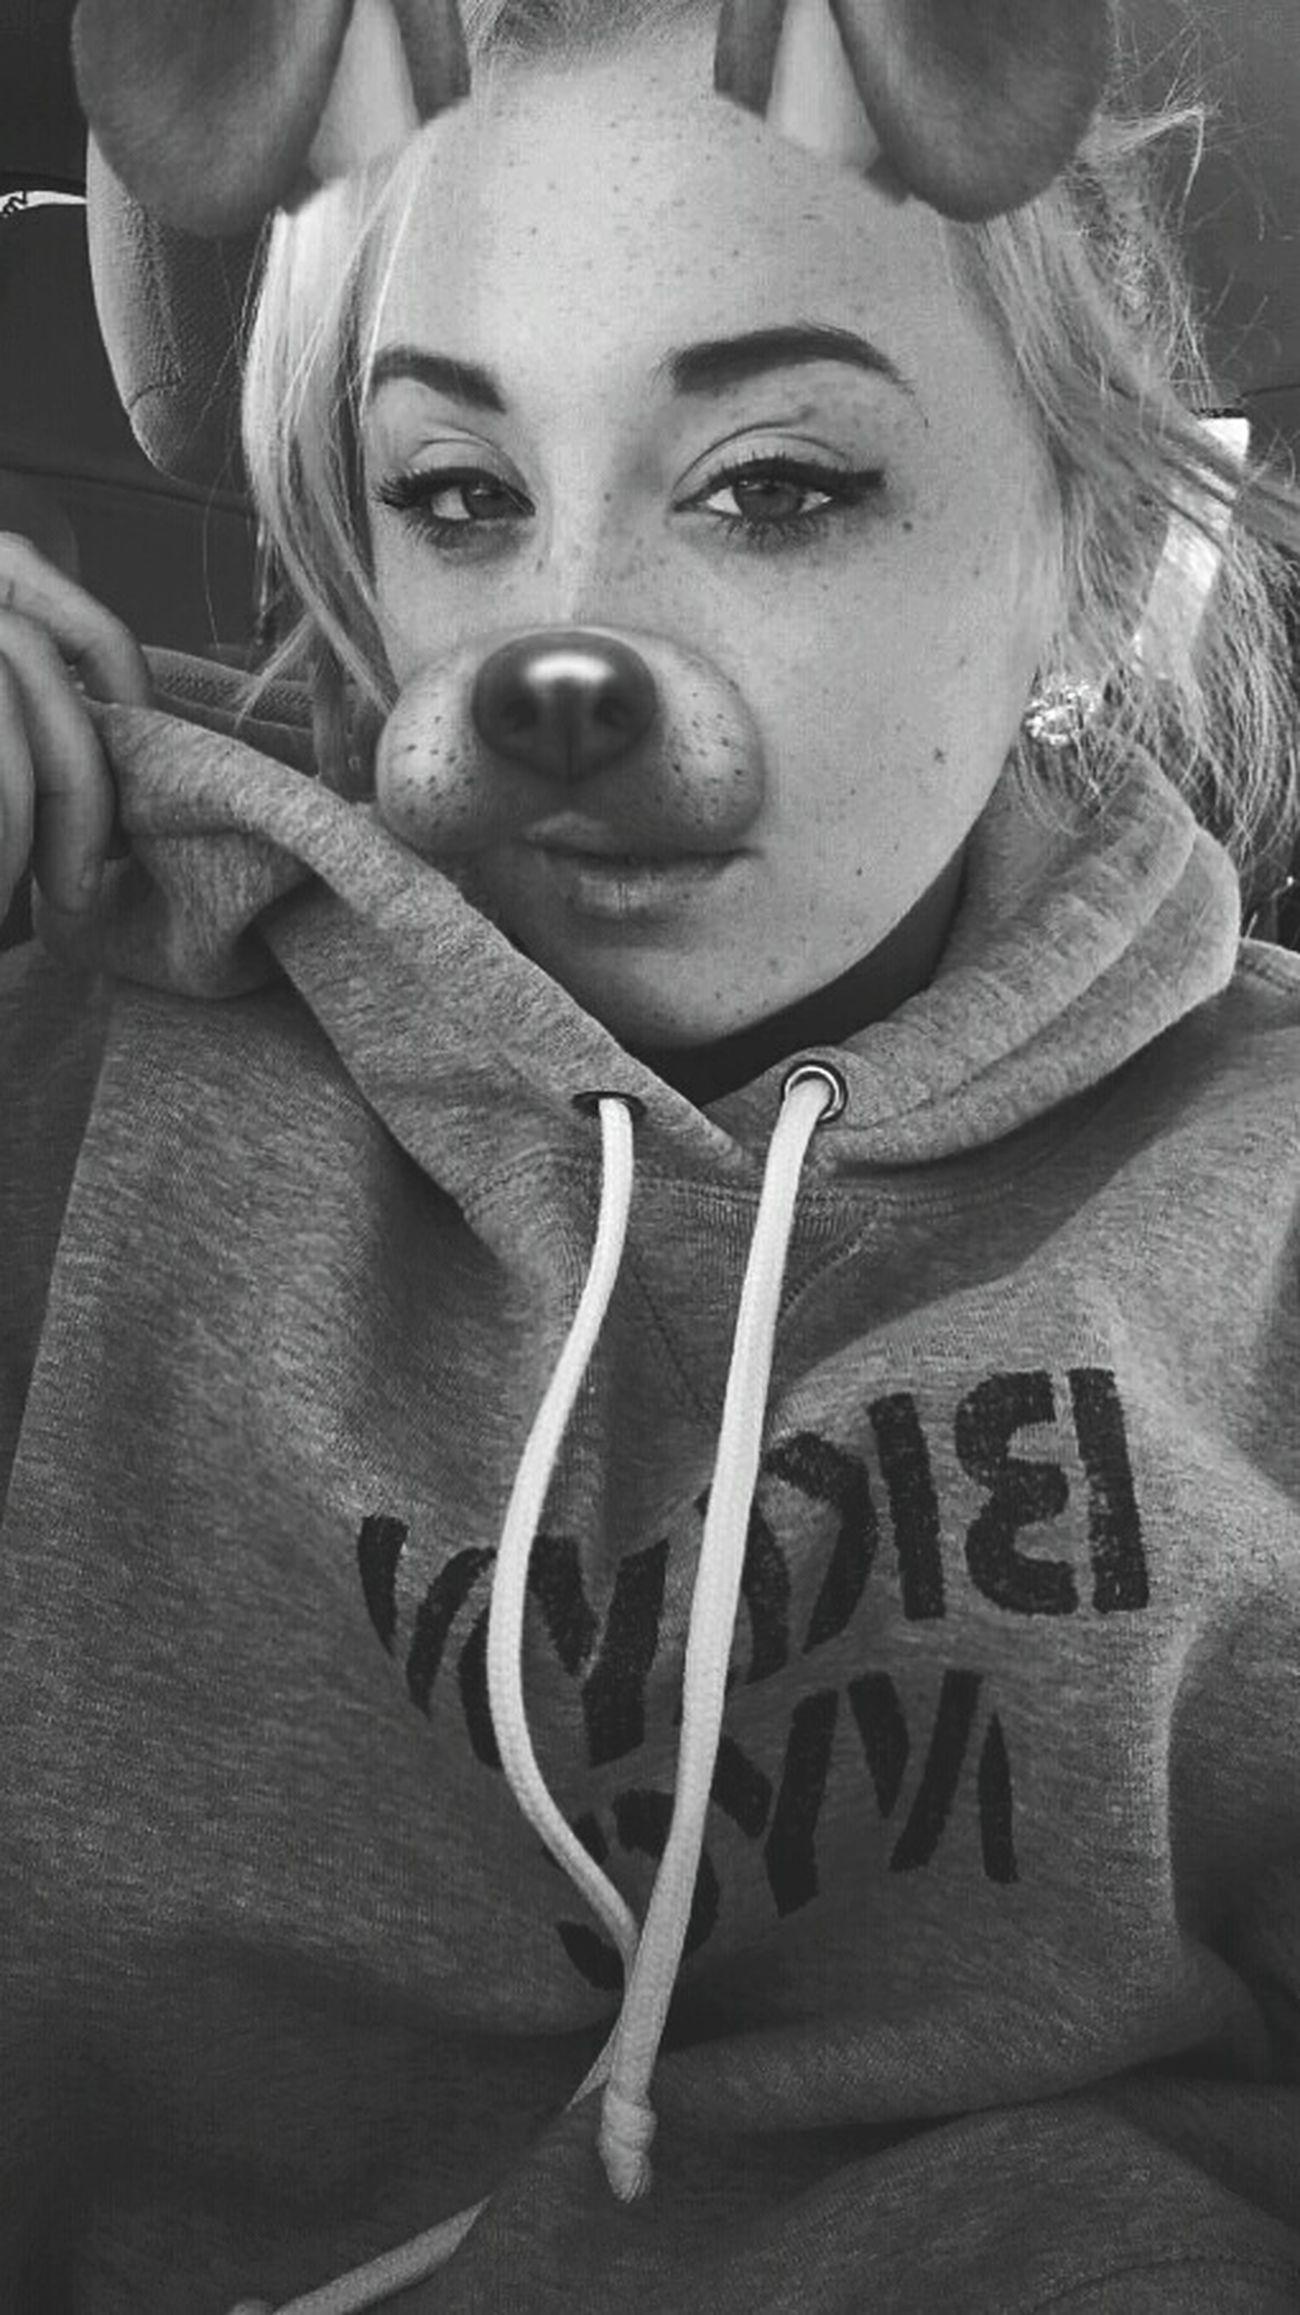 NYC Sweater Hoodie Onehuman Female Selfie Beauty Snapchatfilter Blomdehair Doggy Eyes Gages Plugs